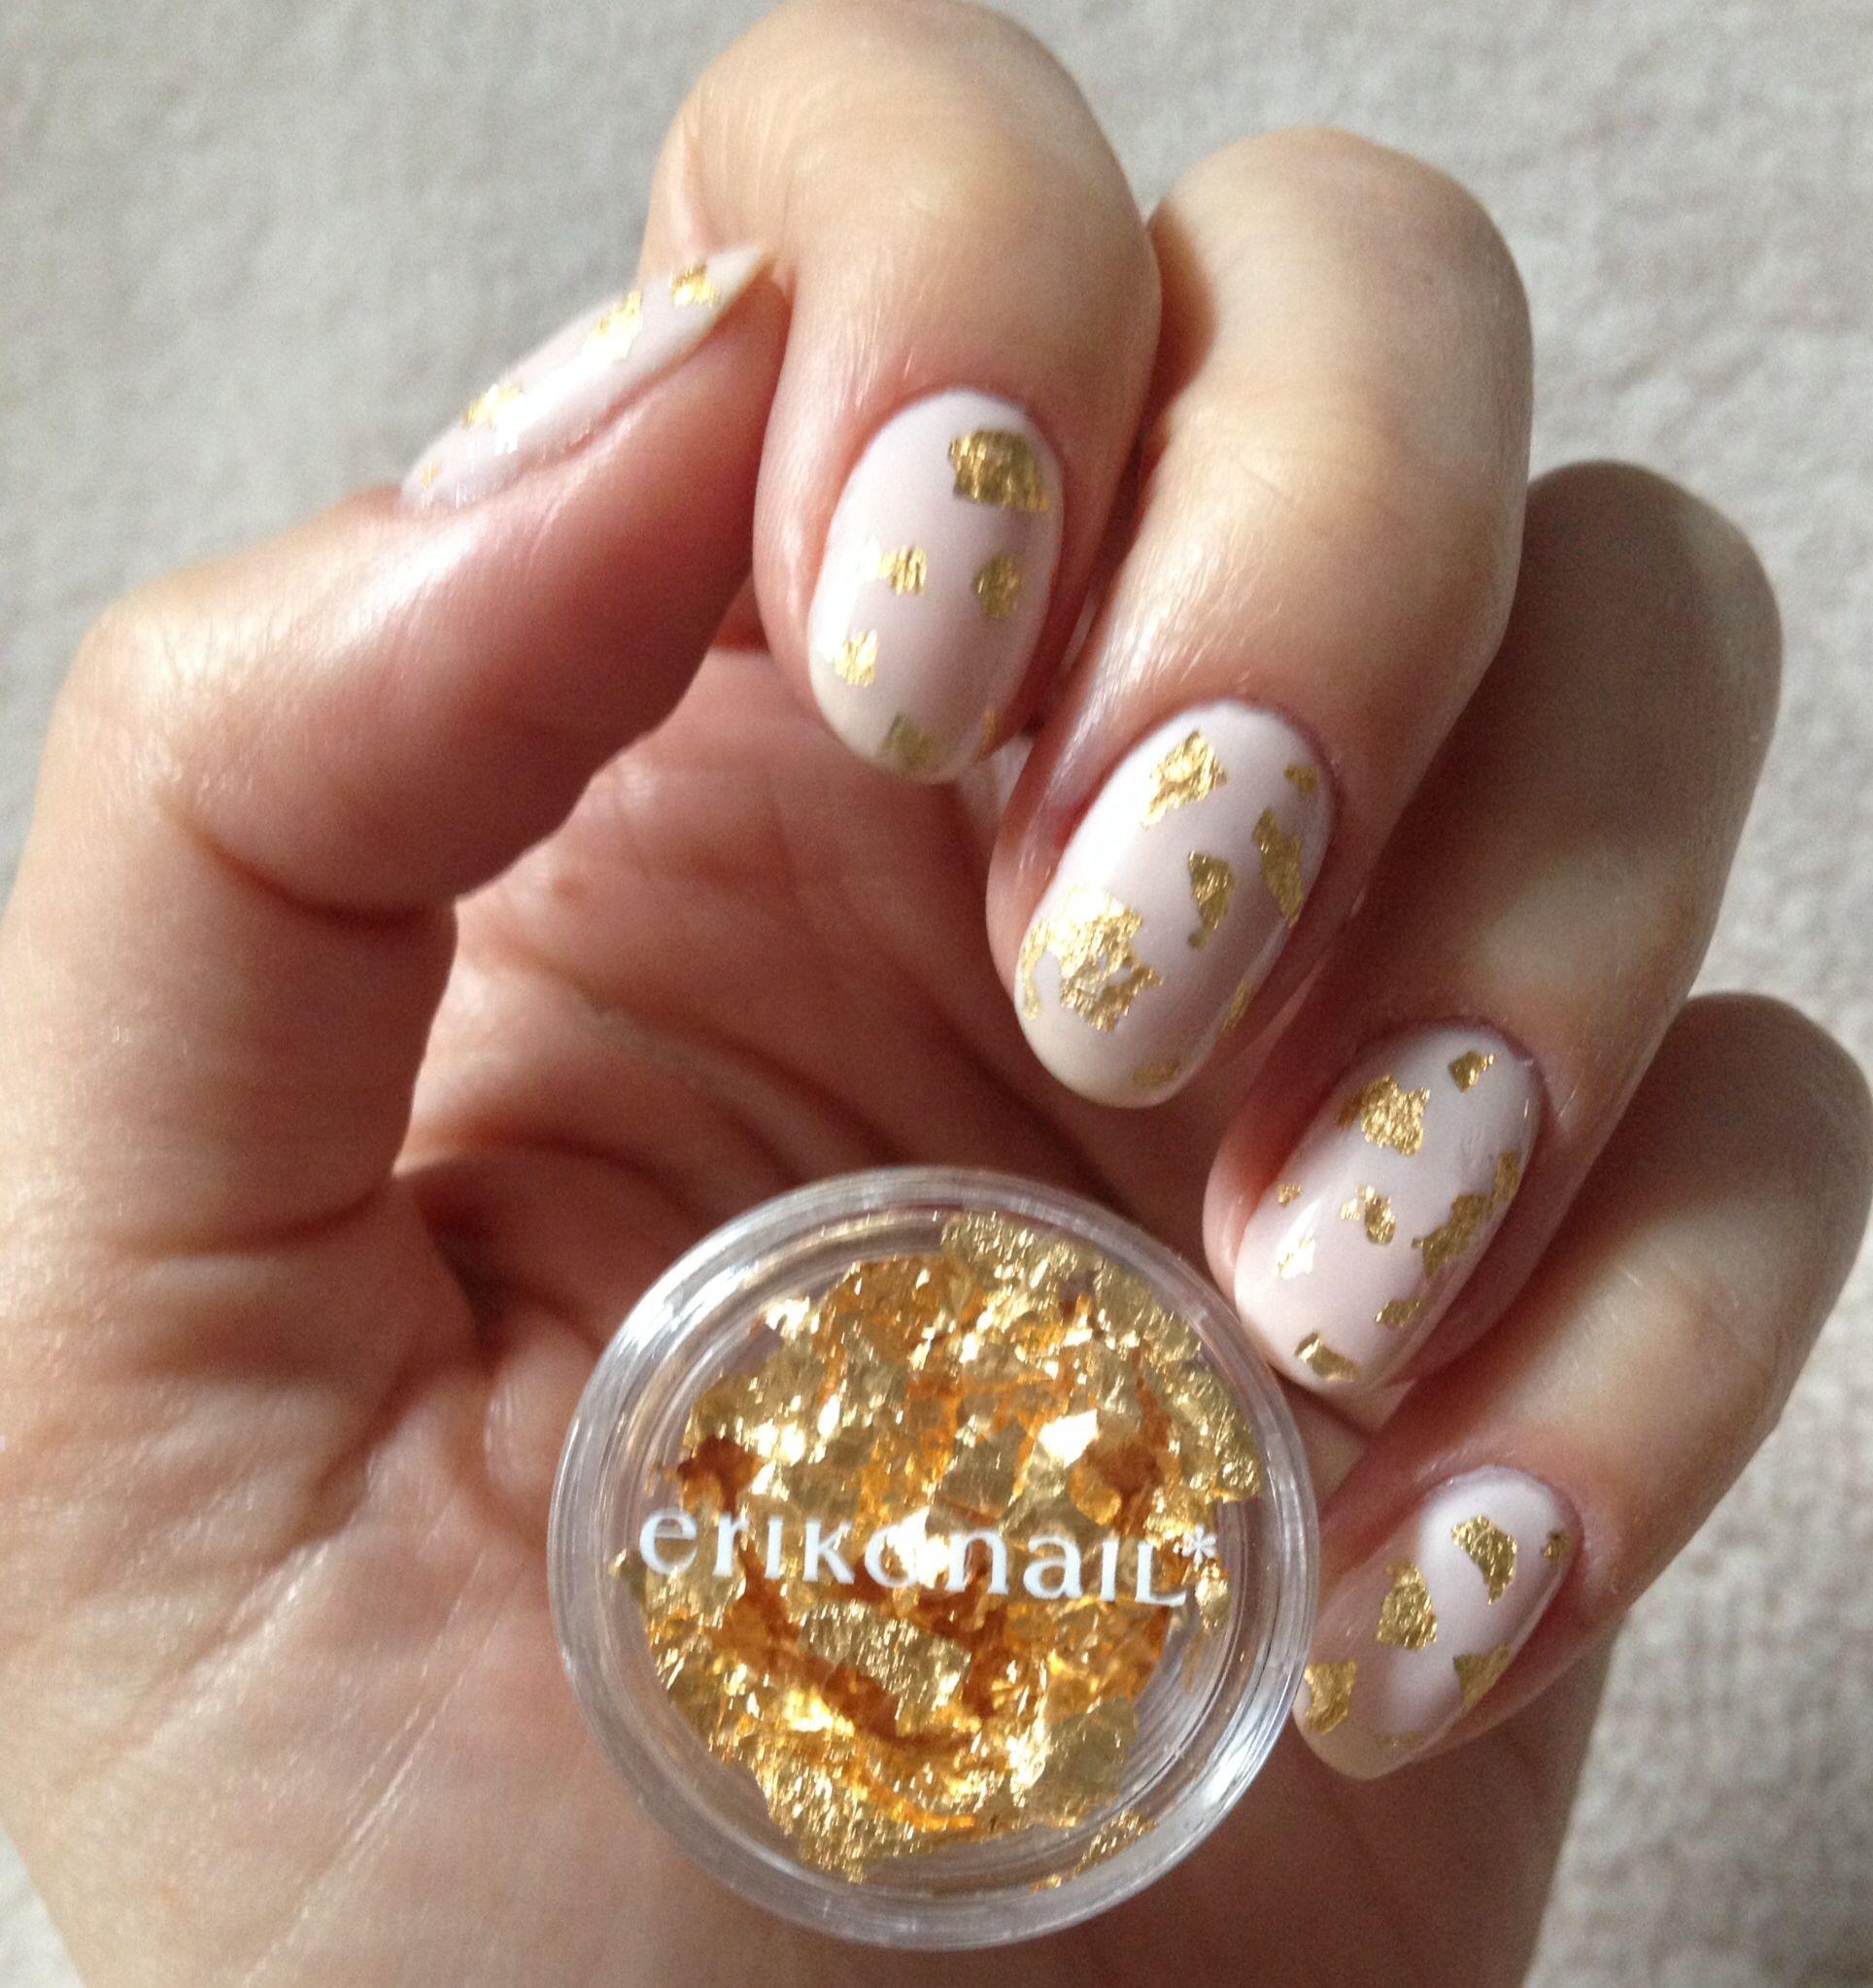 Gold leaf mani opi step right up | nail polish | Pinterest